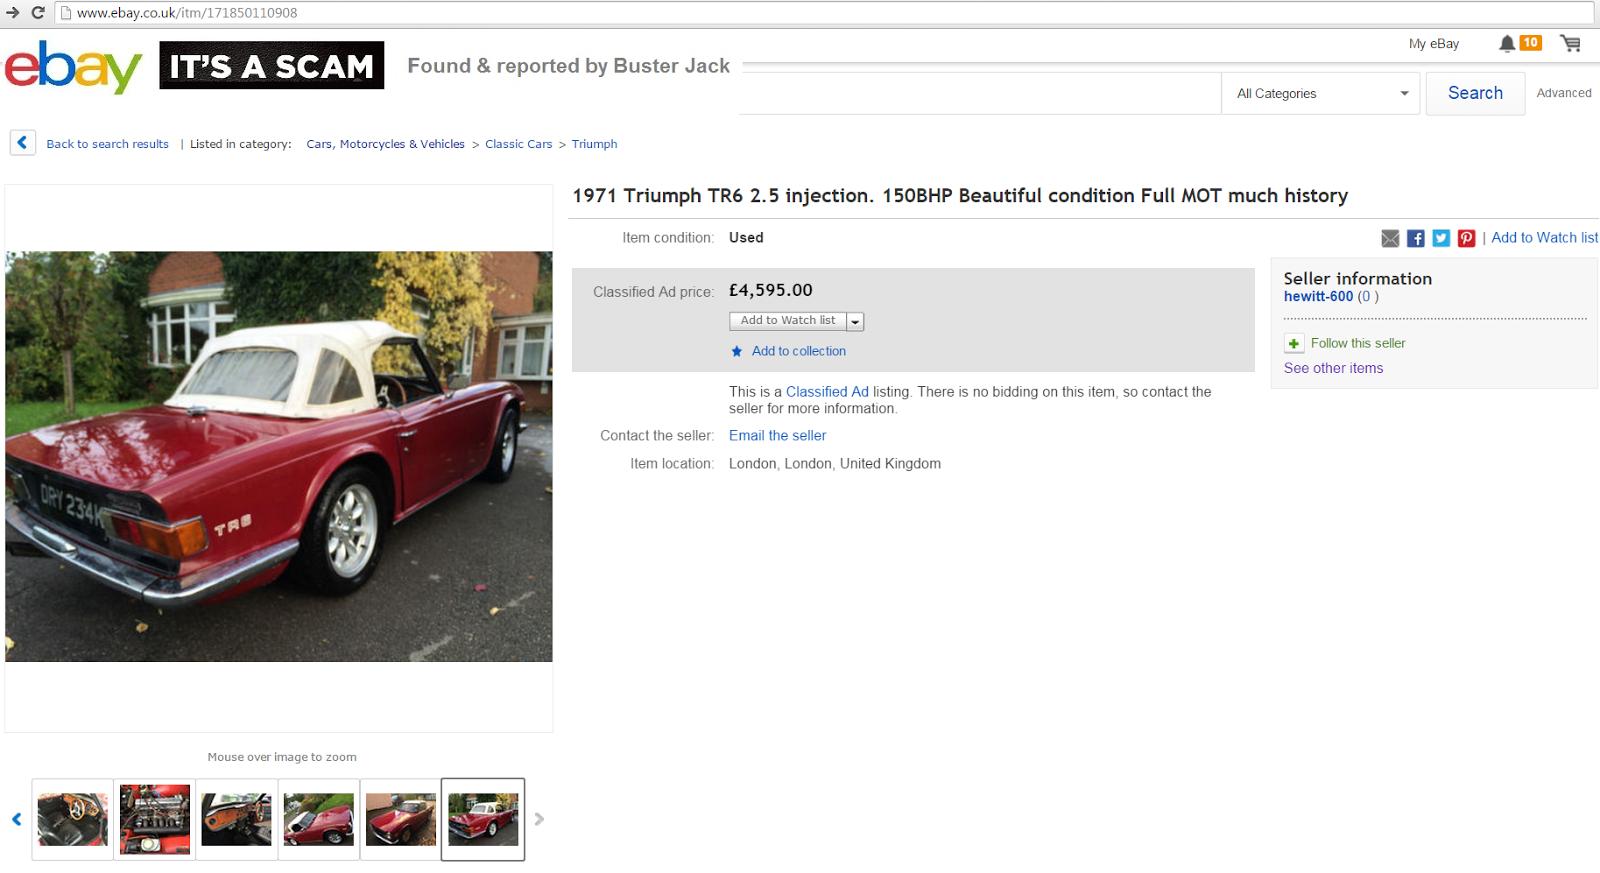 EBAY SCAM : 1971 Triumph TR6 2.5 injection. 150BHP   DRY234K ...